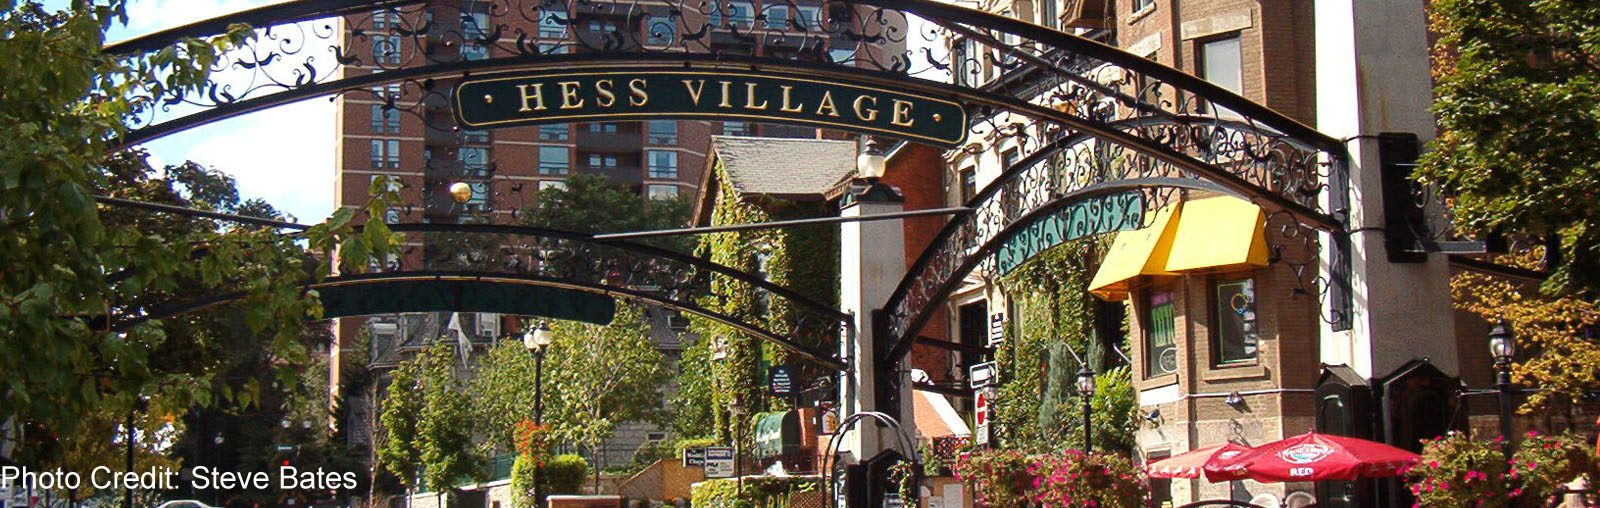 Hamilton - Hess Village area - sliver (Steve Bates)